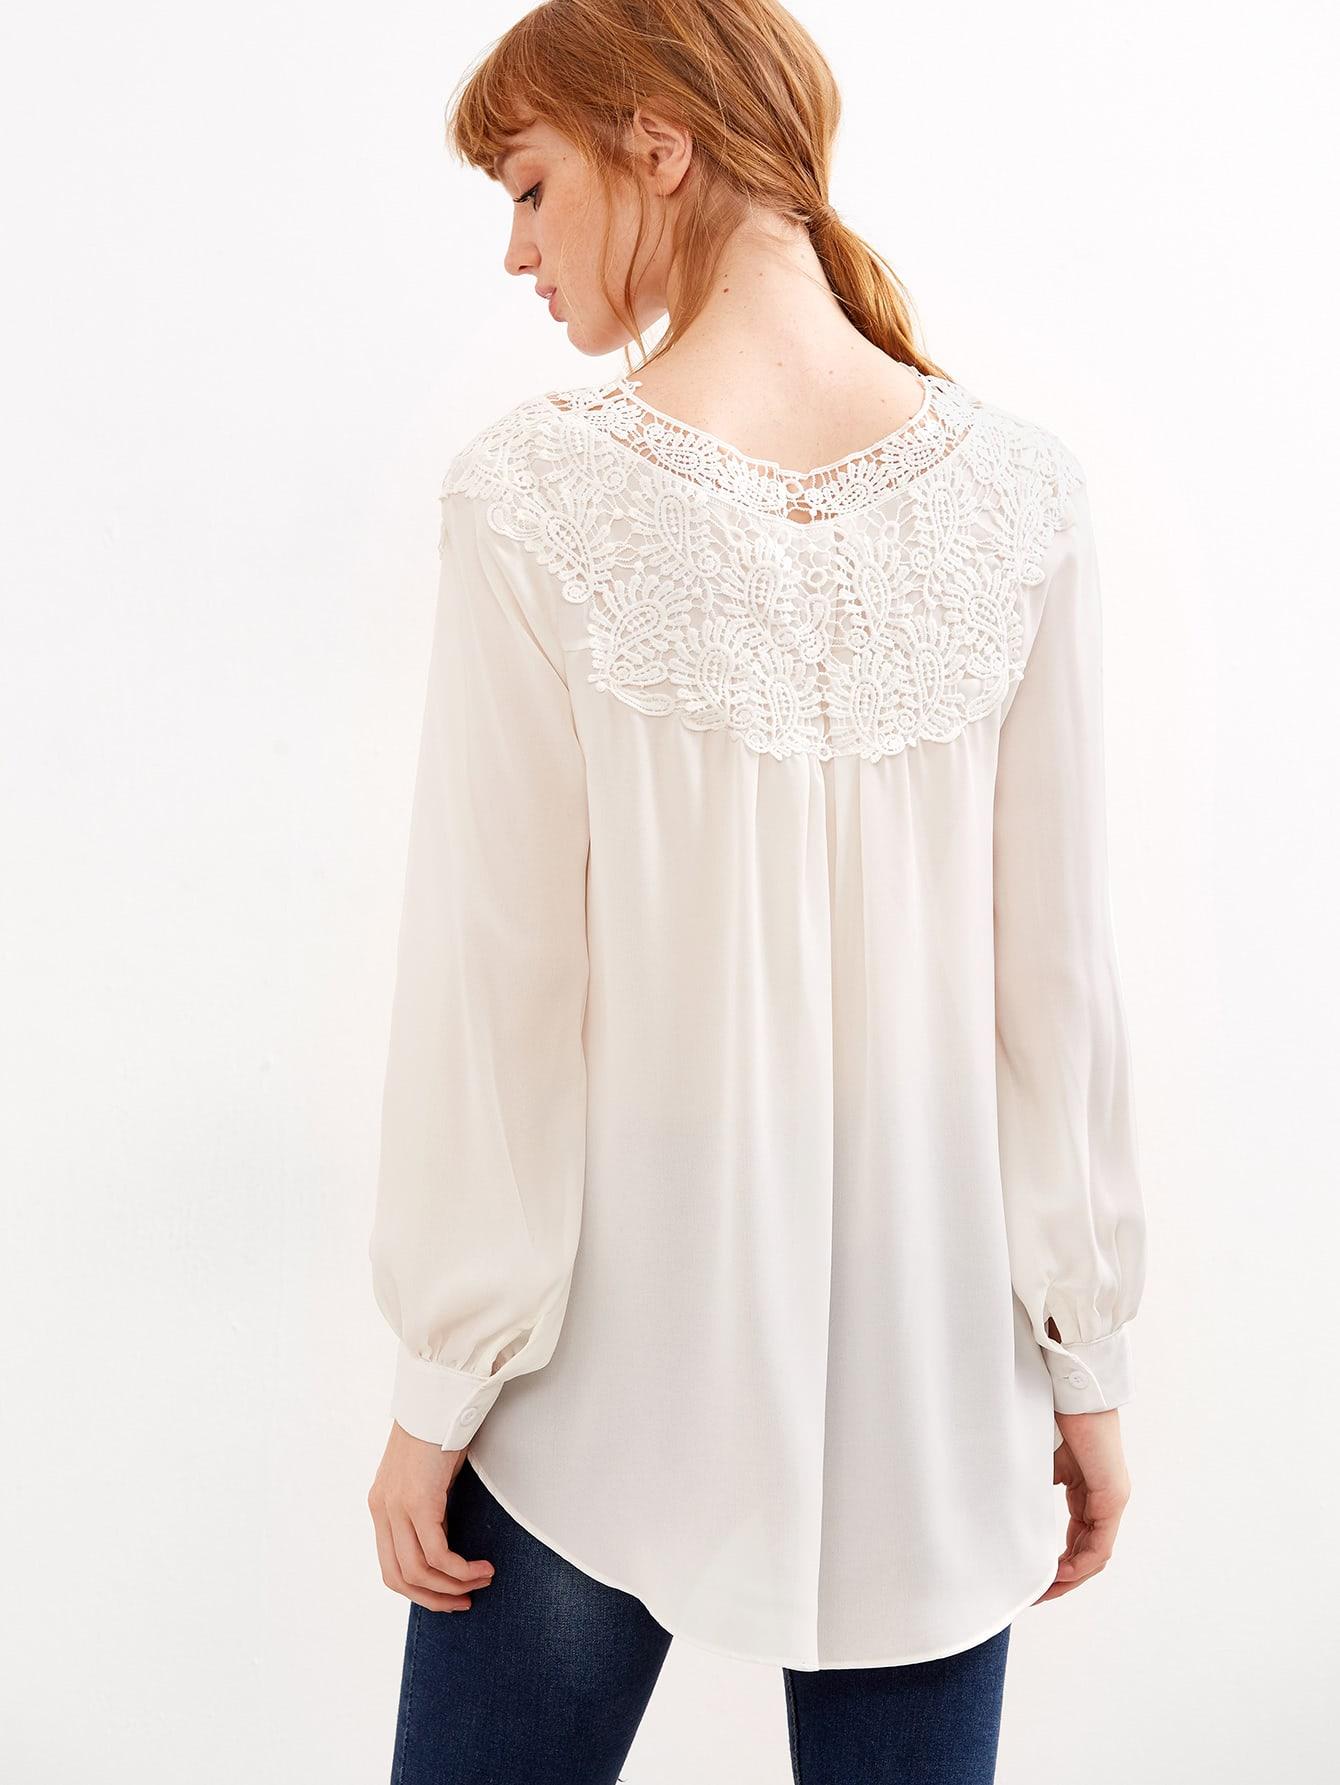 blouse160913105_2